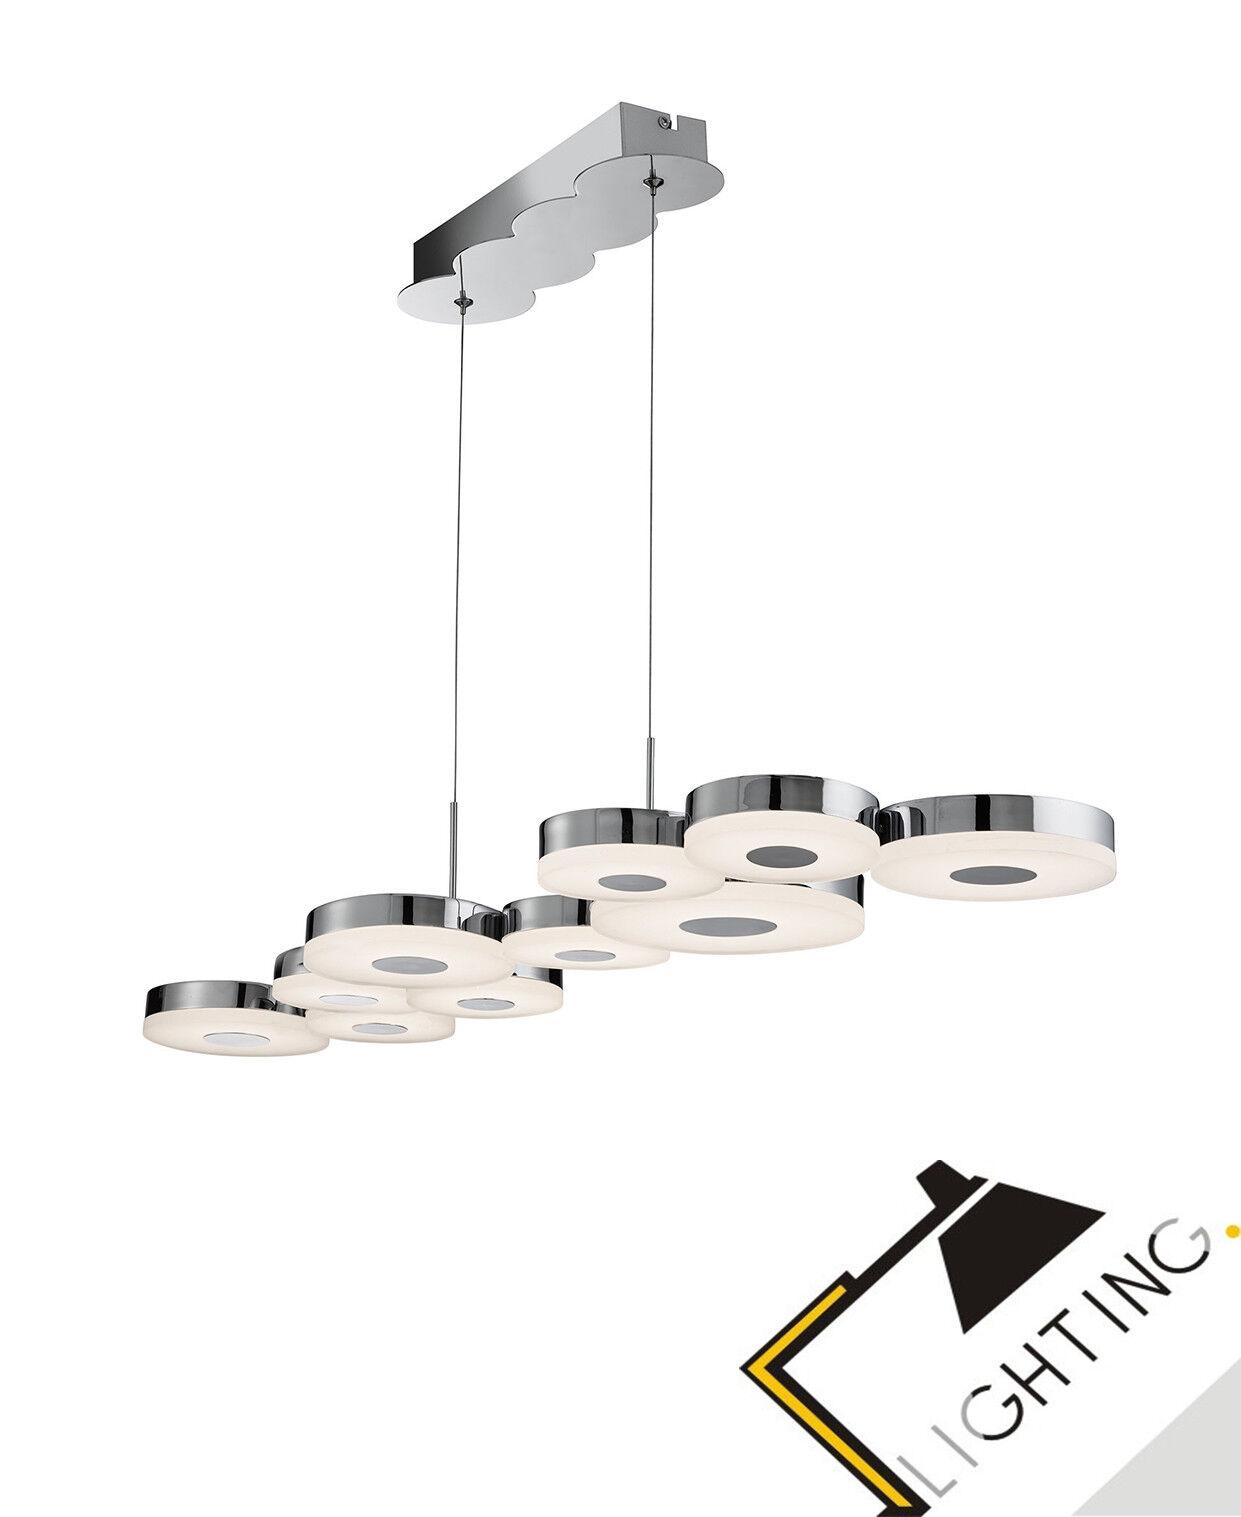 Moderne 10-flammige Pendelleuchte Hängeleuchte Lampe Luster Leuchte  Chrom  LED